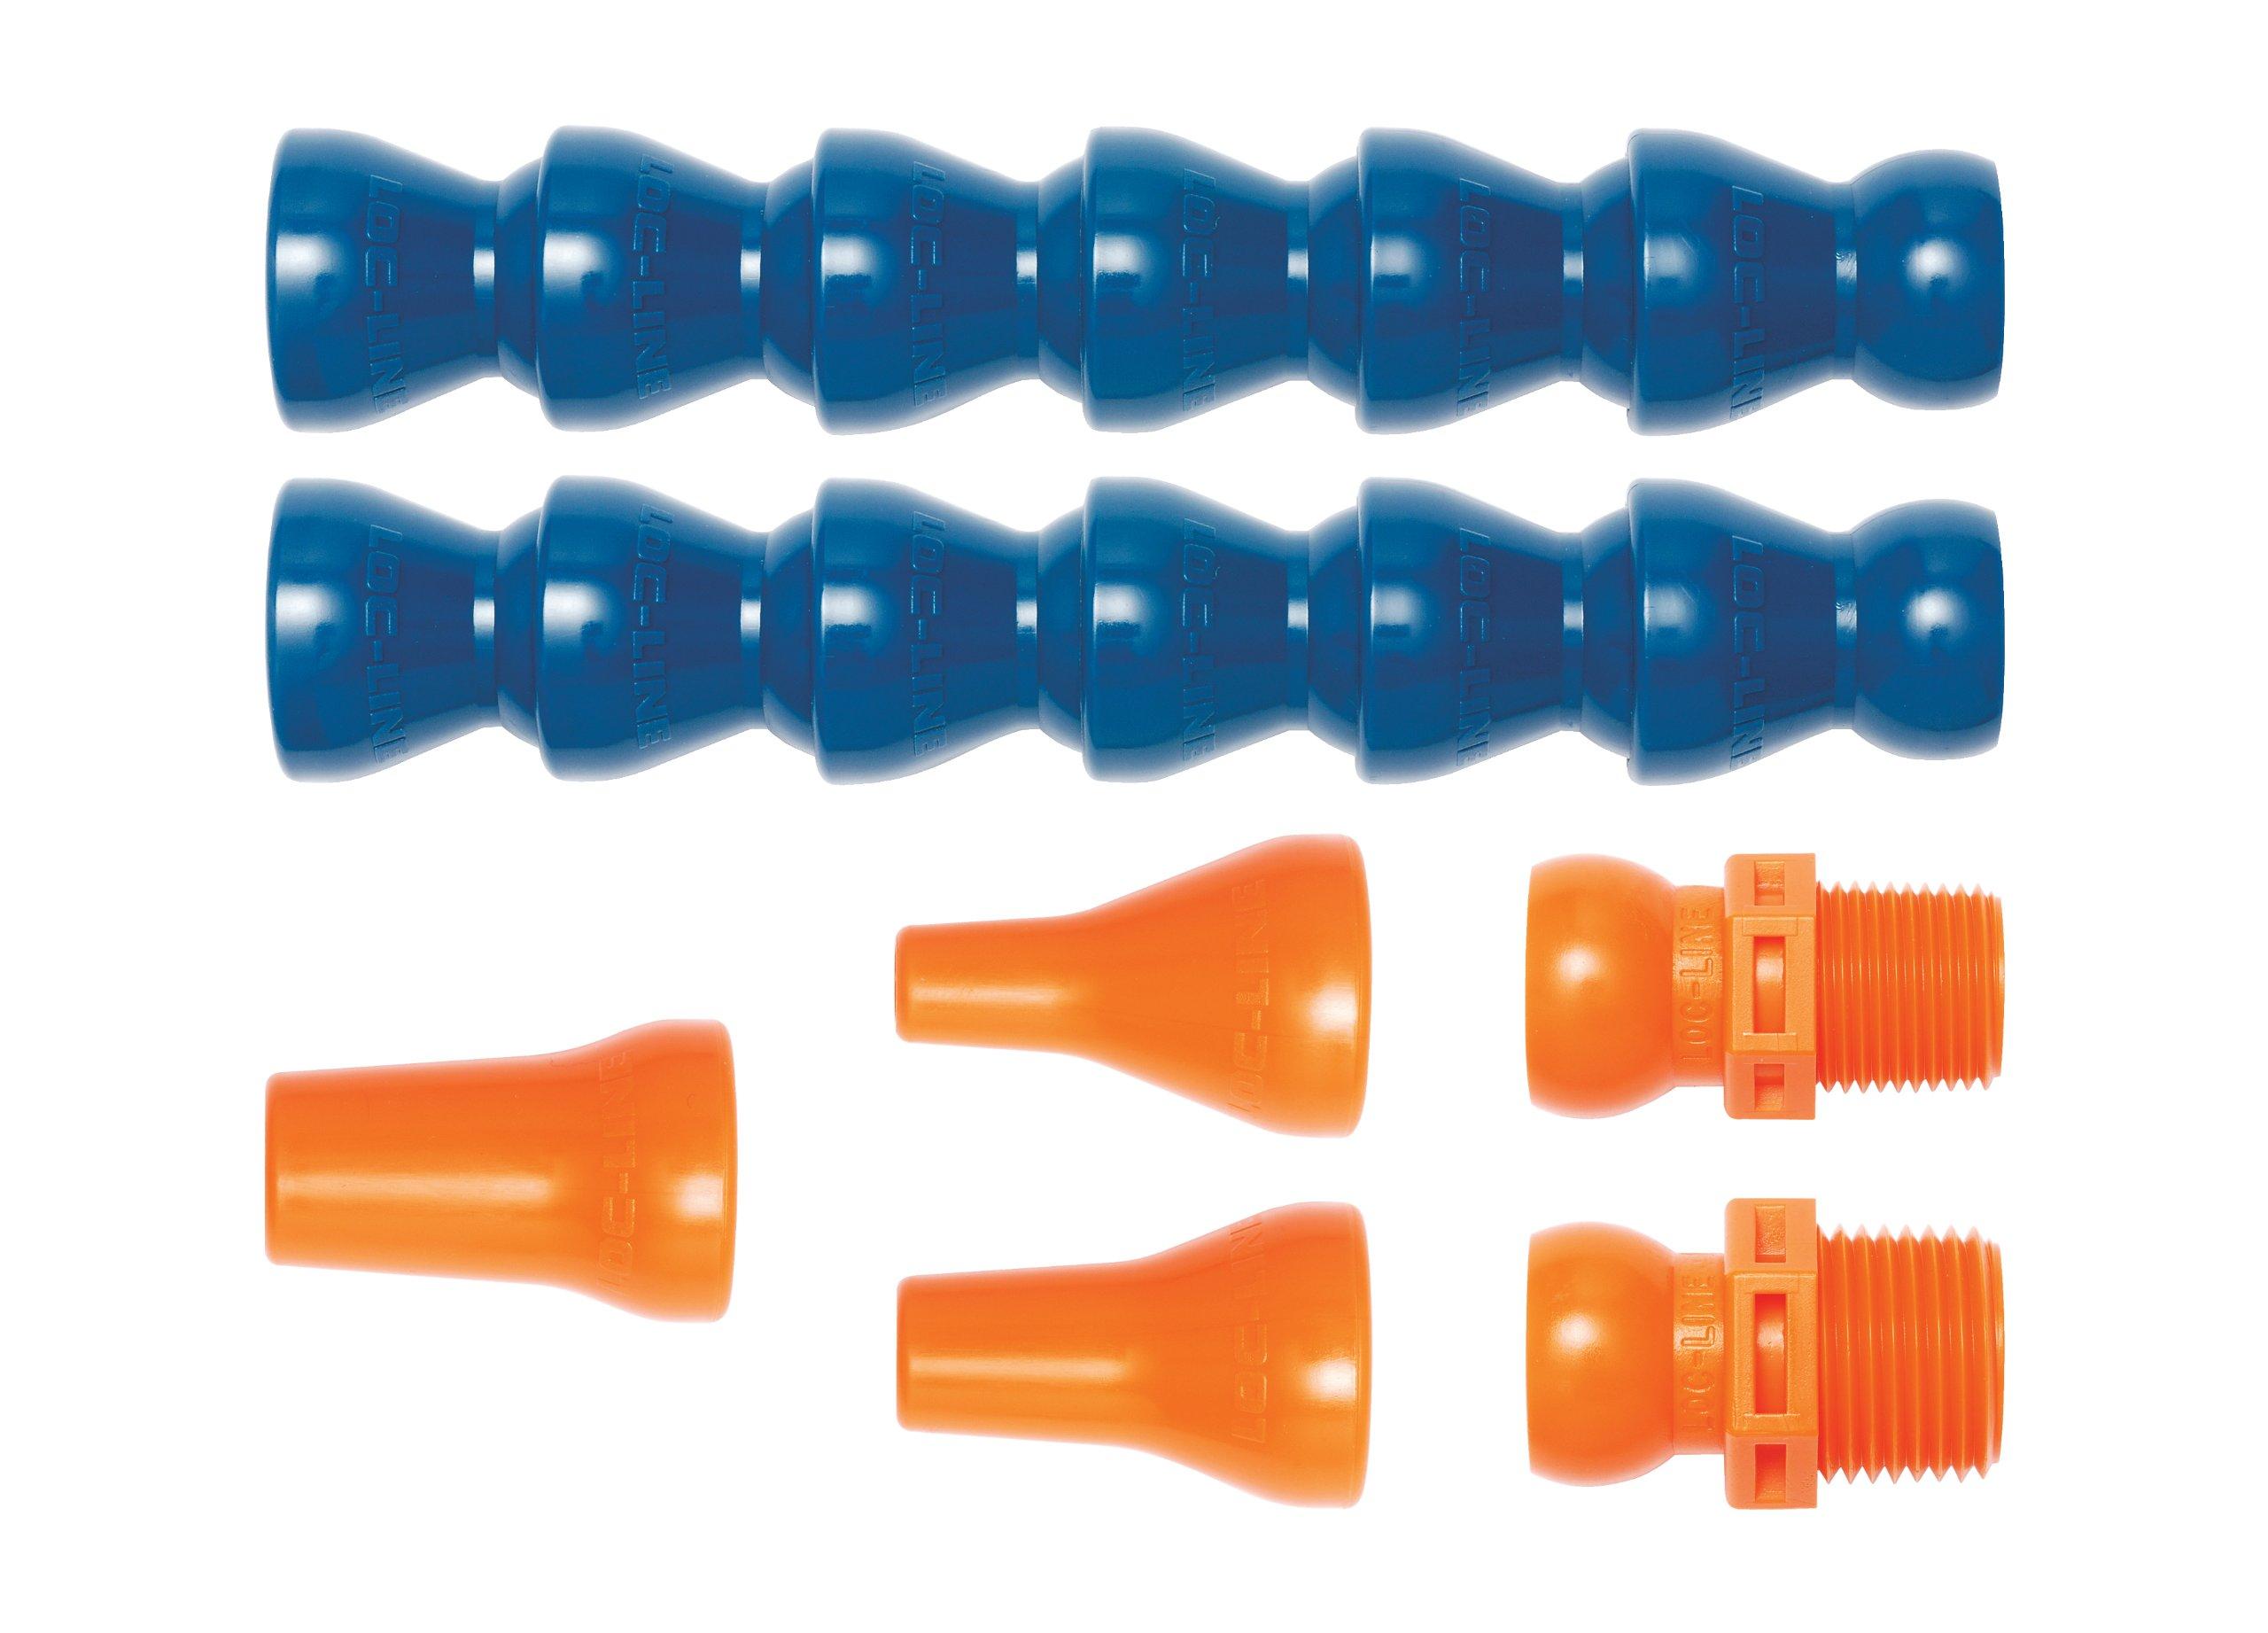 6 Length x 3-1//2 Width Loc-Line Anti-Static Vacuum Hose Component 2-1//2 Hose ID Rectangular Nozzle Black Acetal Copolymer